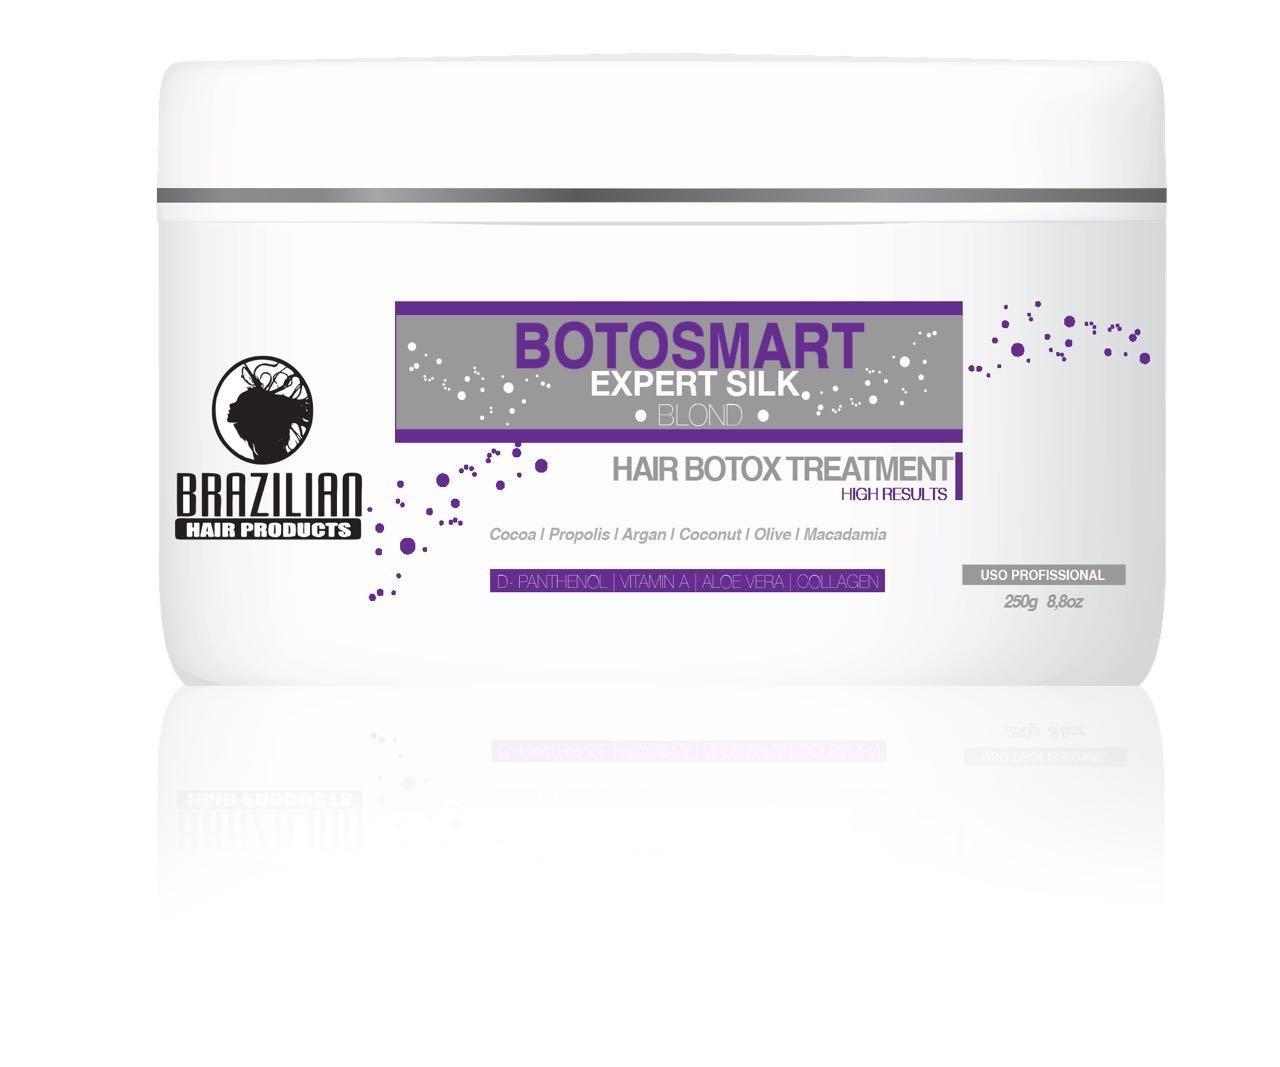 BotoSmart Brasileño Expert Silk Cabellos Rubios 250ml NEW brazilianhairproducts